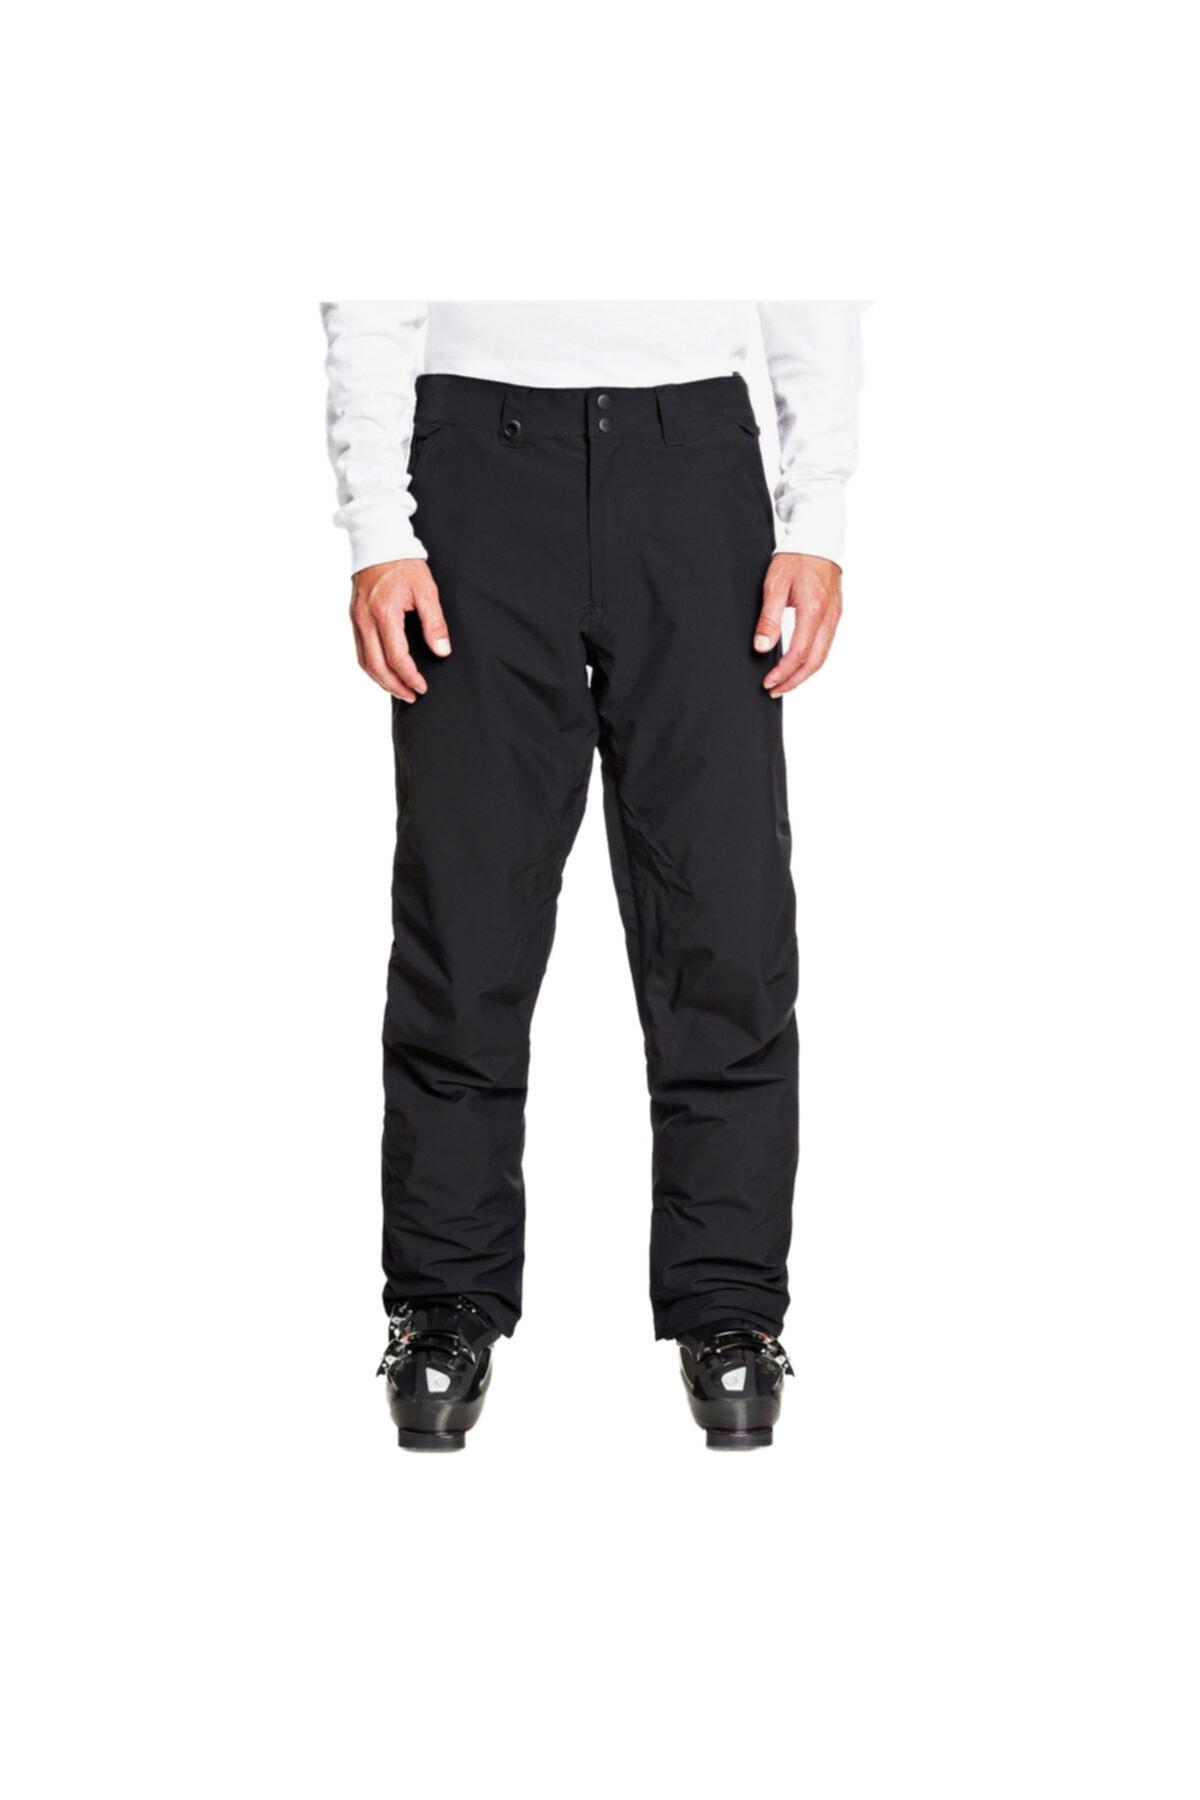 Quiksilver Quıksılver Estate Erkek Snowboard Pantolonu 1